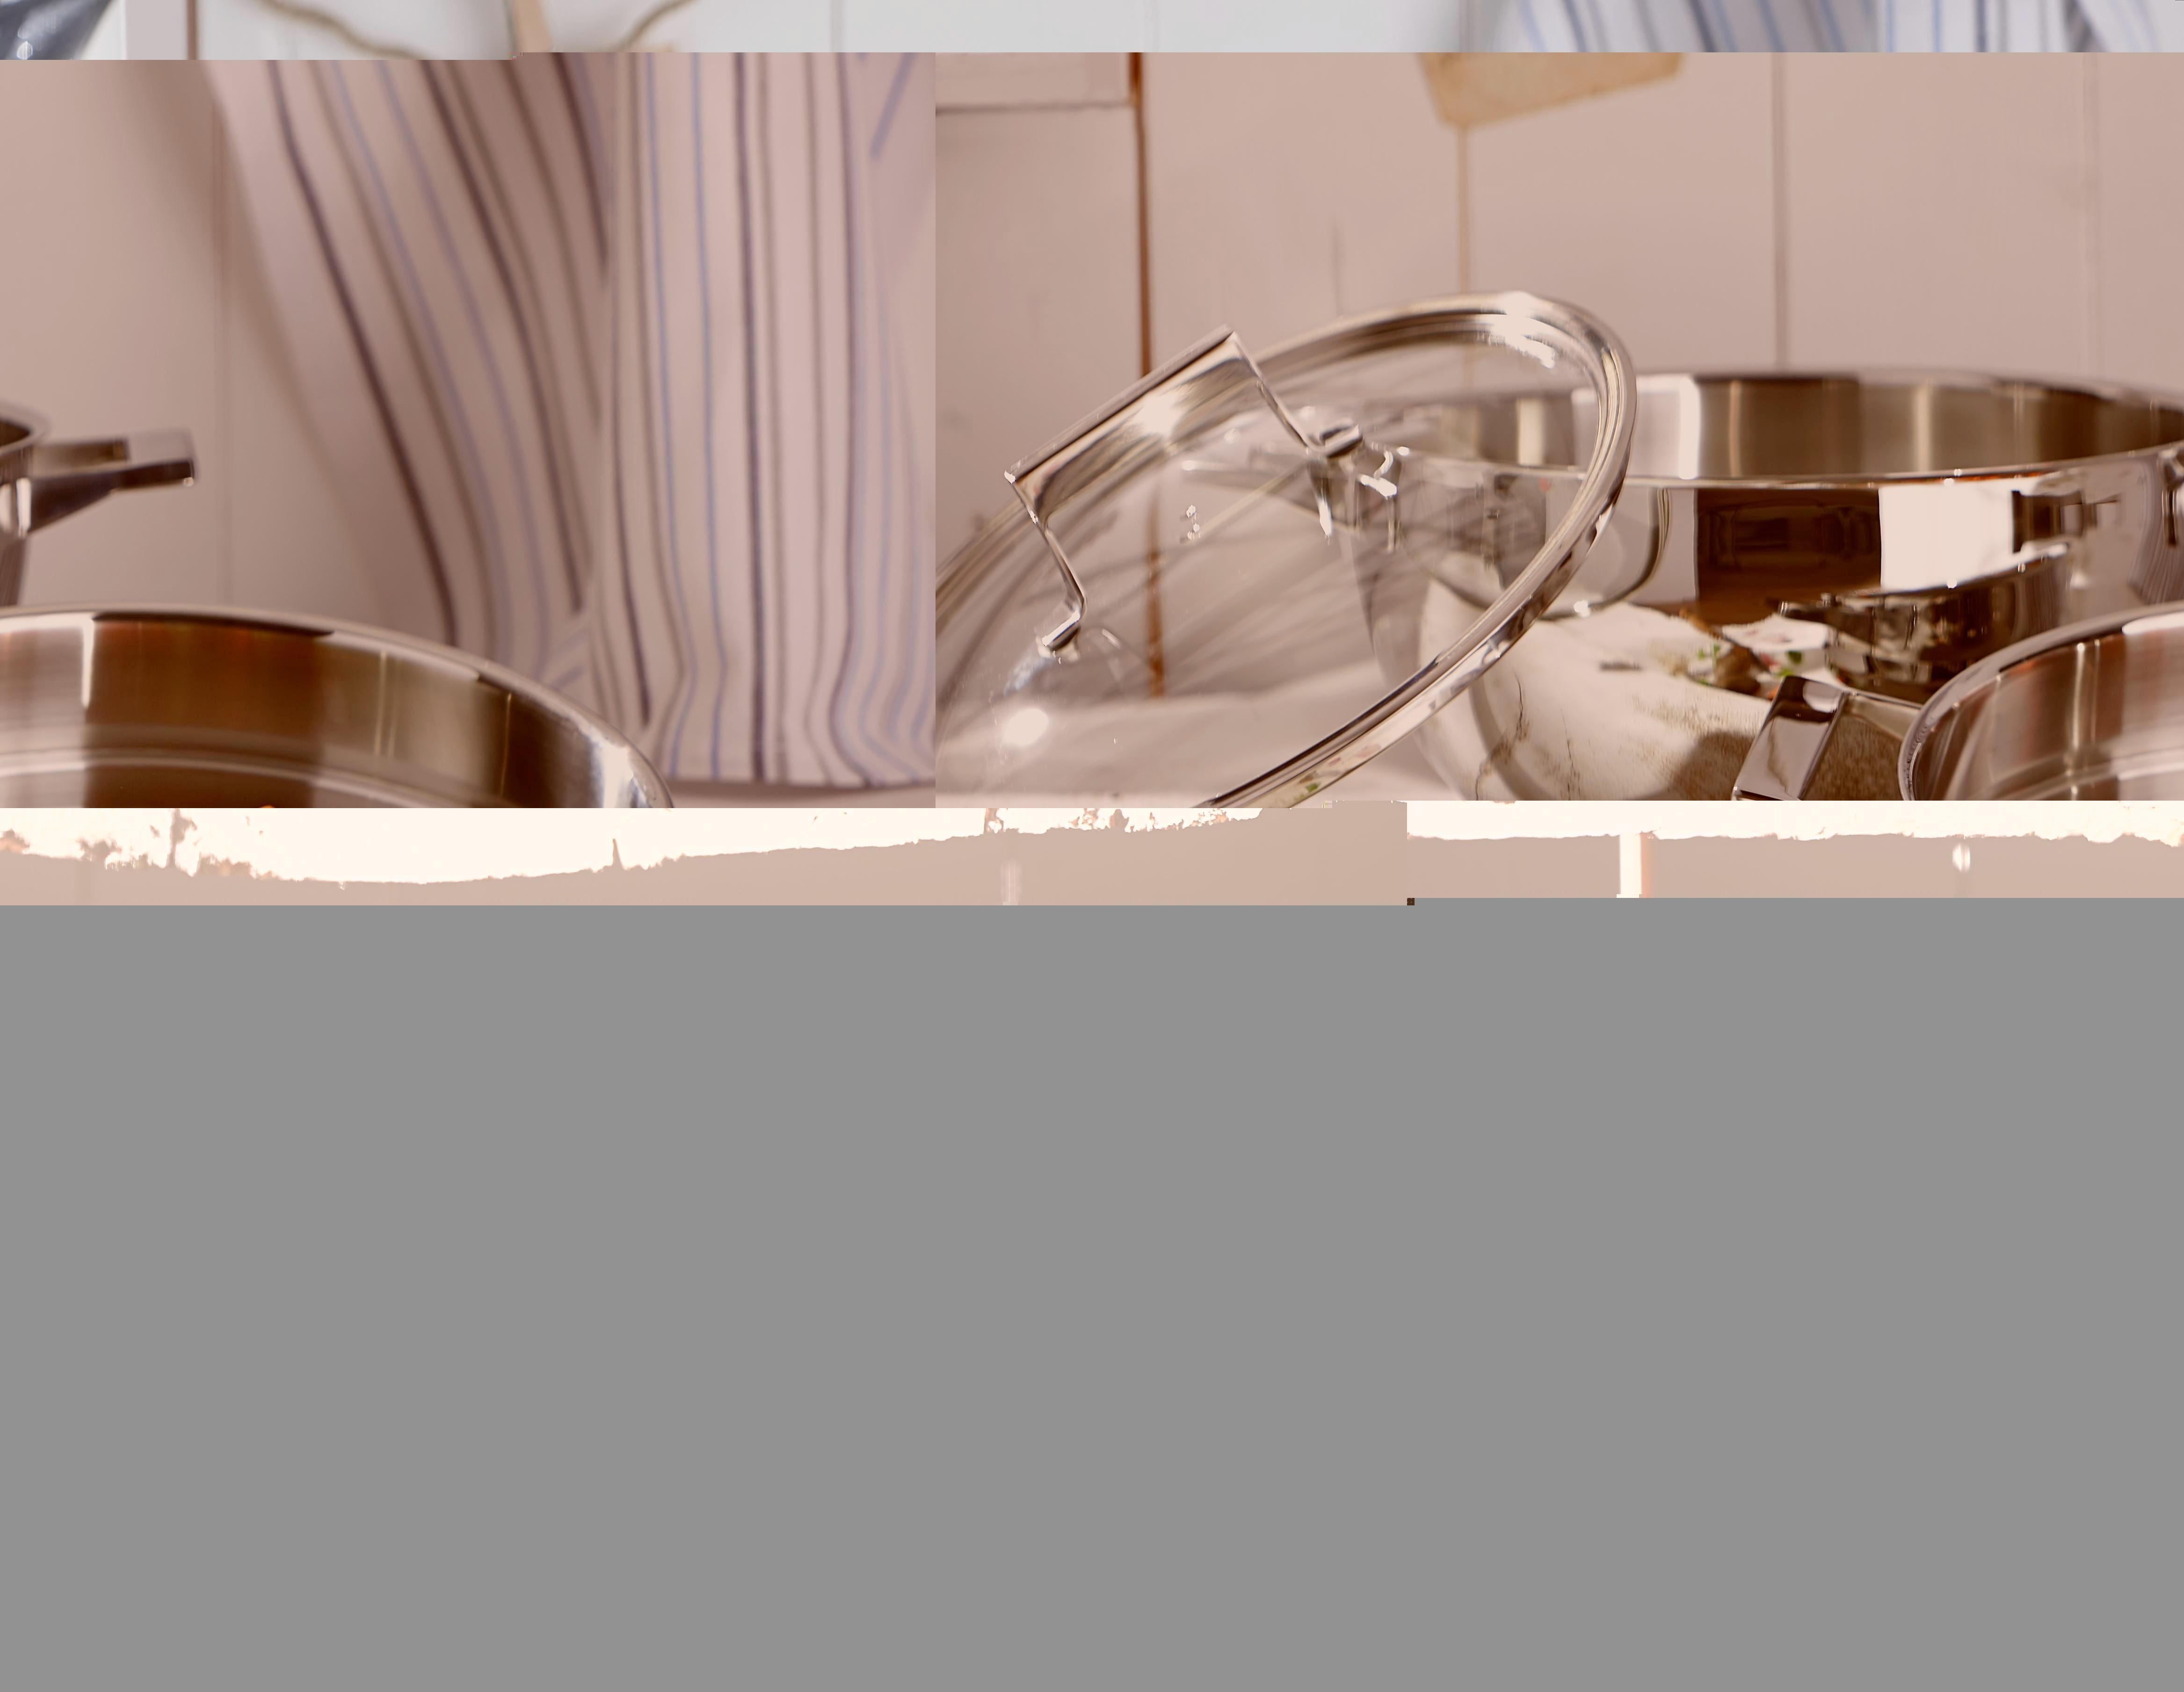 SCHMORTOPF - Klar/Edelstahlfarben, Glas/Metall (26cm) - HOMEWARE